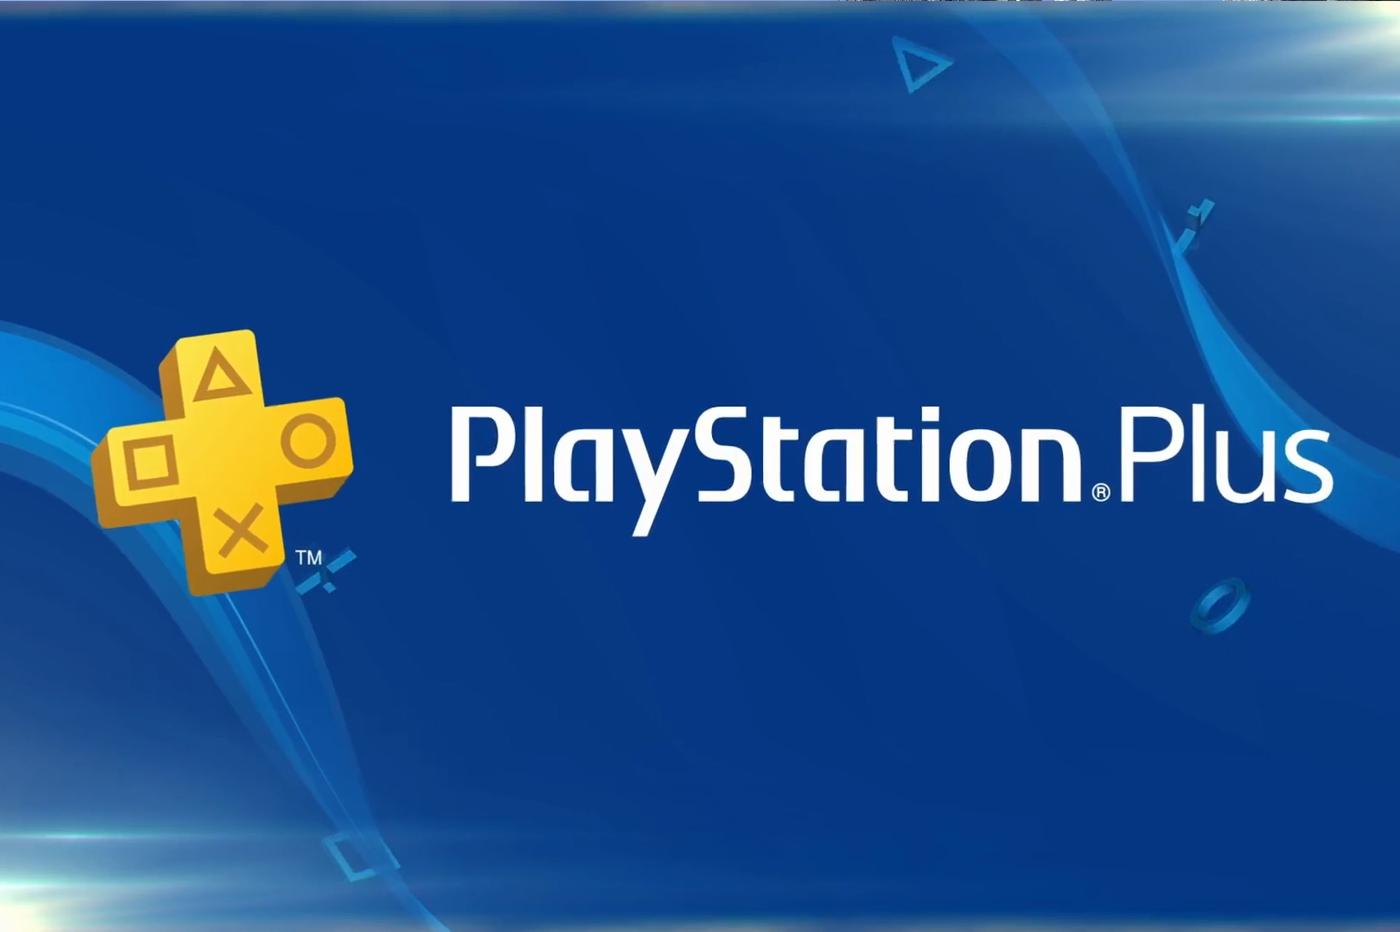 Sony va augmenter les prix du PlayStation Plus